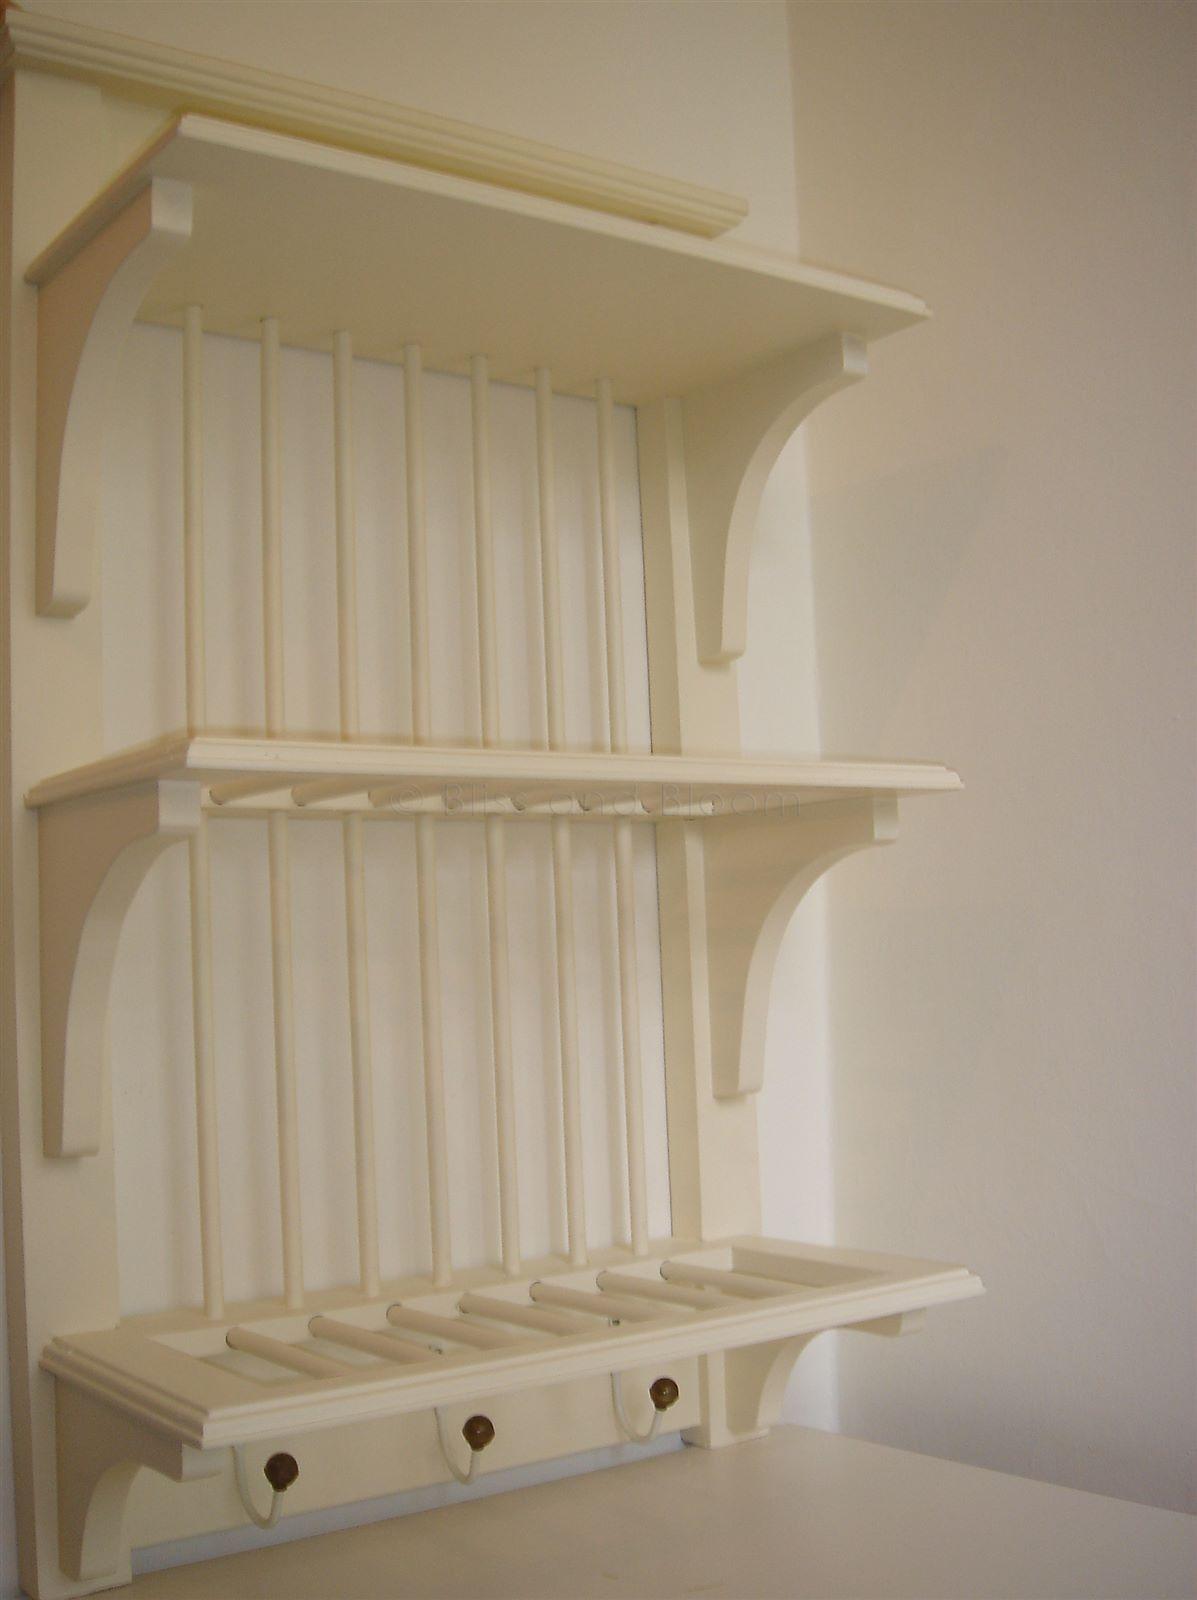 Cream 2 tier plate rack | Bliss and Bloom Ltd & Cream 2 tier plate rack | Bliss and Bloom Ltd | Kitchen ideas ...